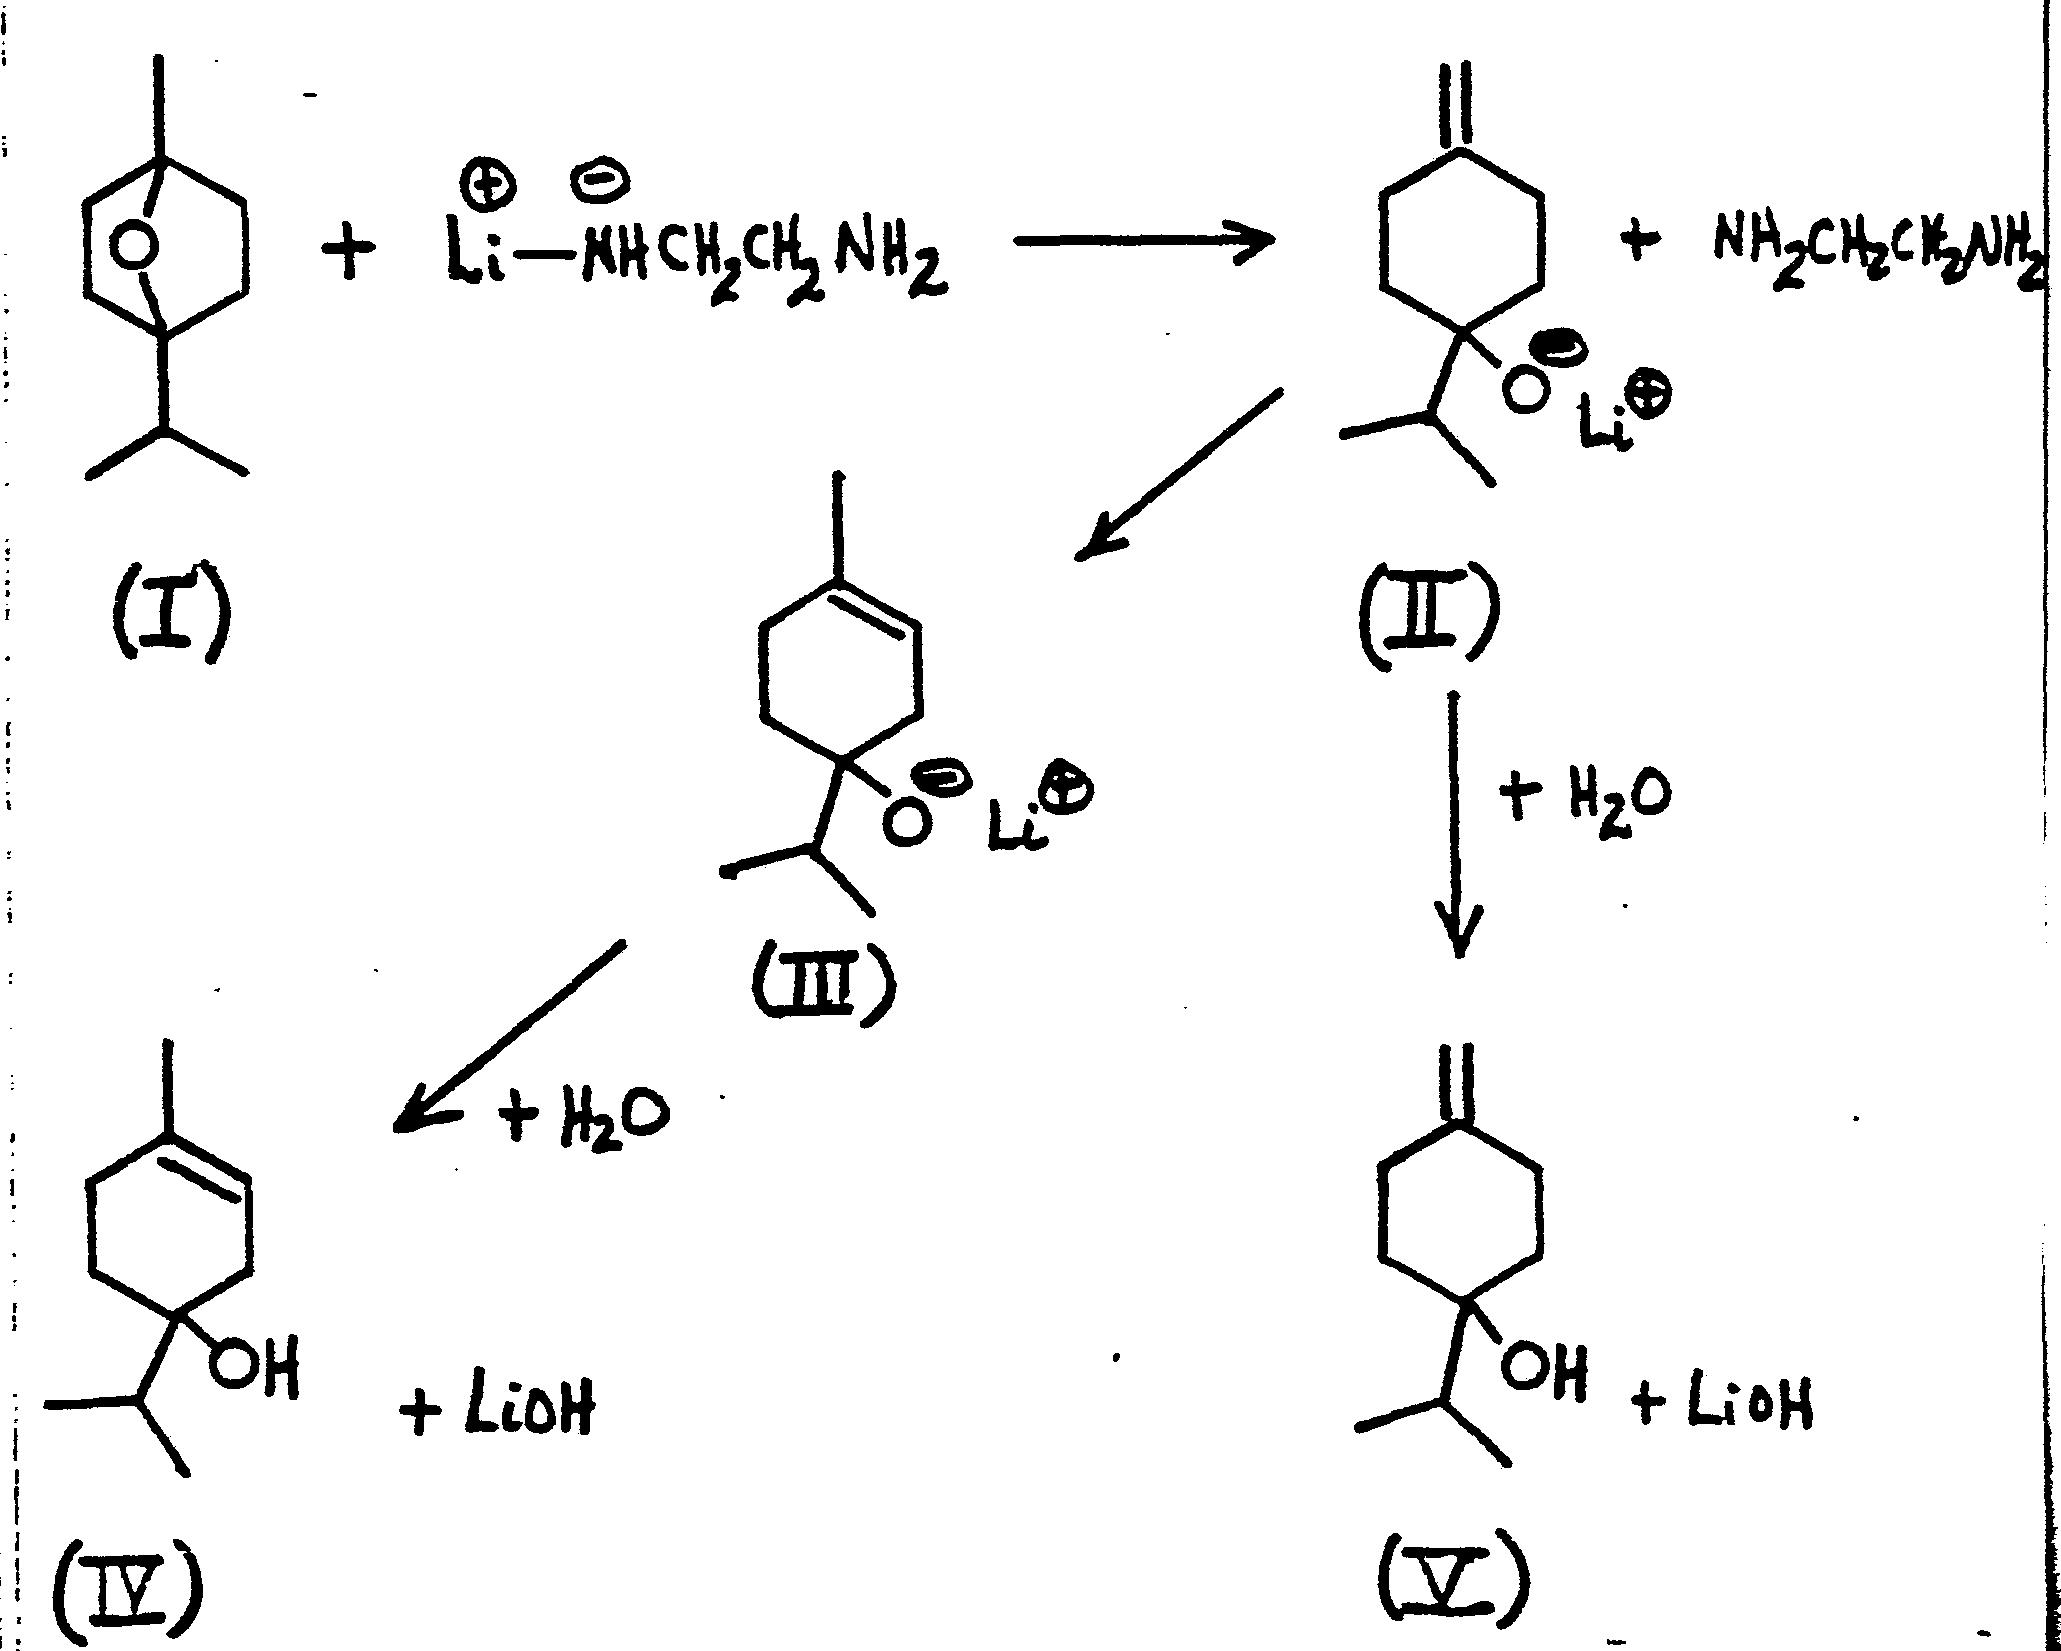 ep0200811a1 - preparation of terpinen-4-ols